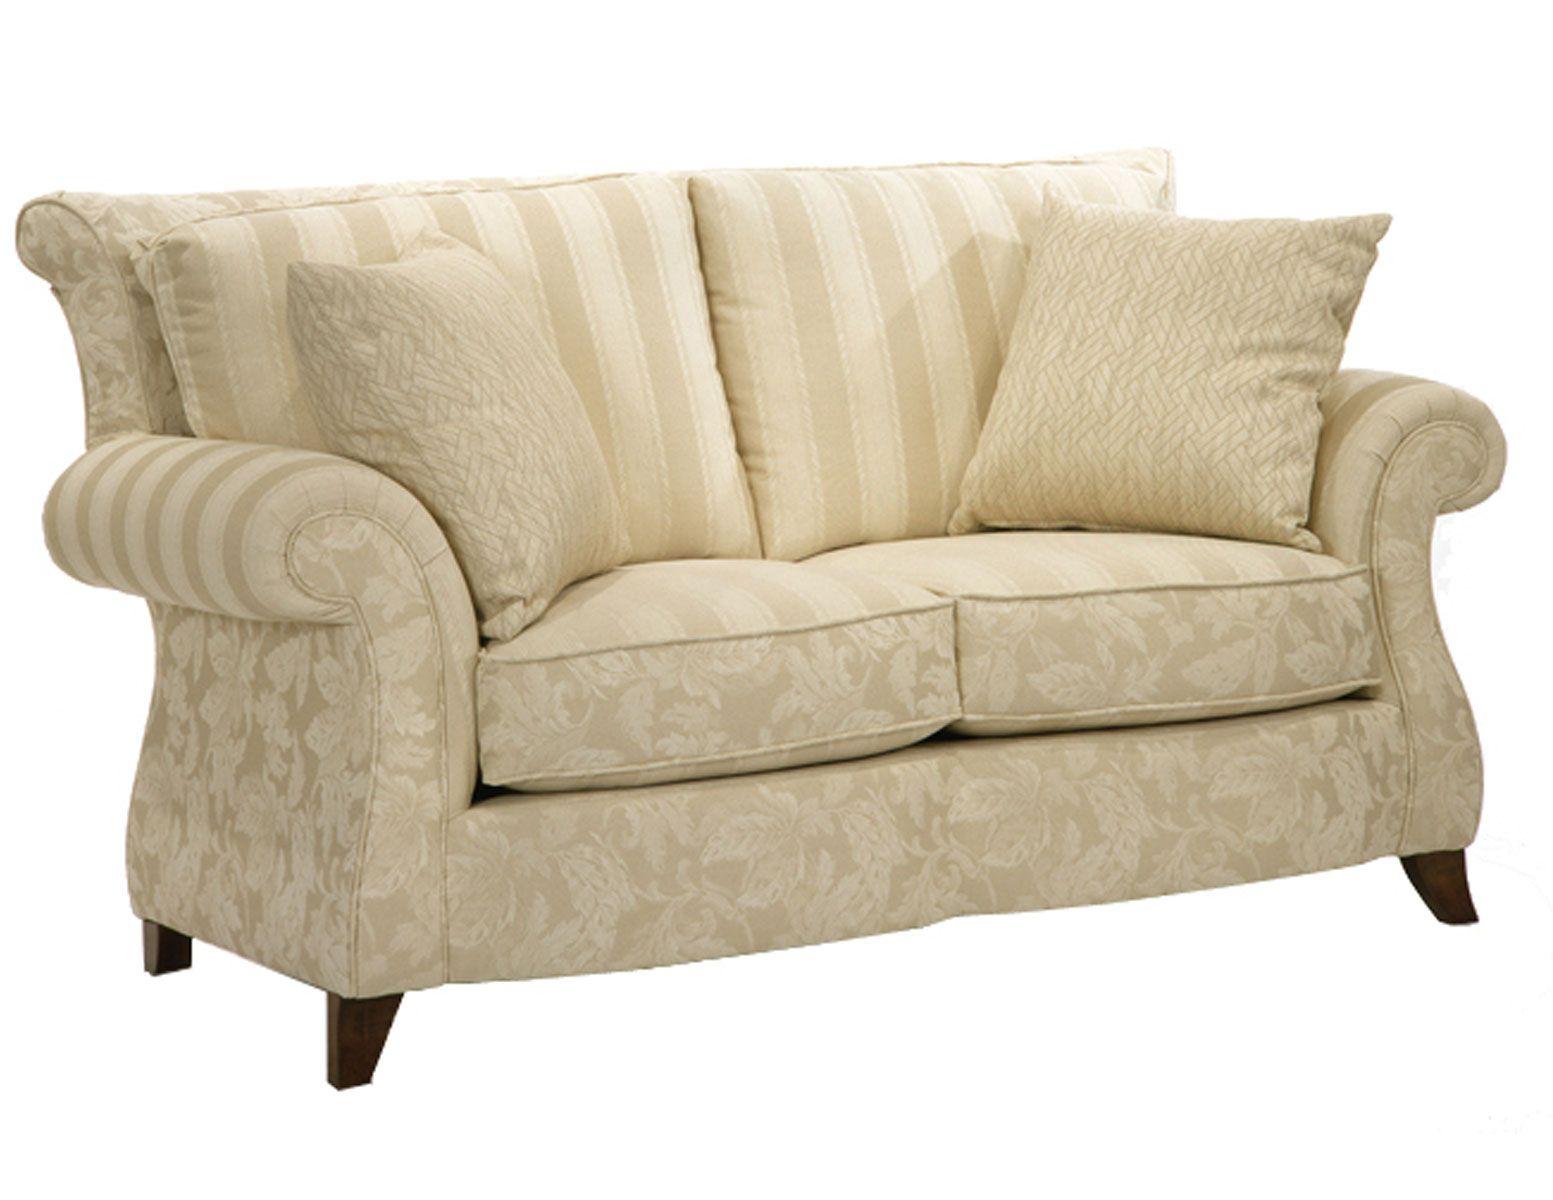 Causeuse En Tissu Mobilier Philippe Dagenais Love Seat Furniture Design